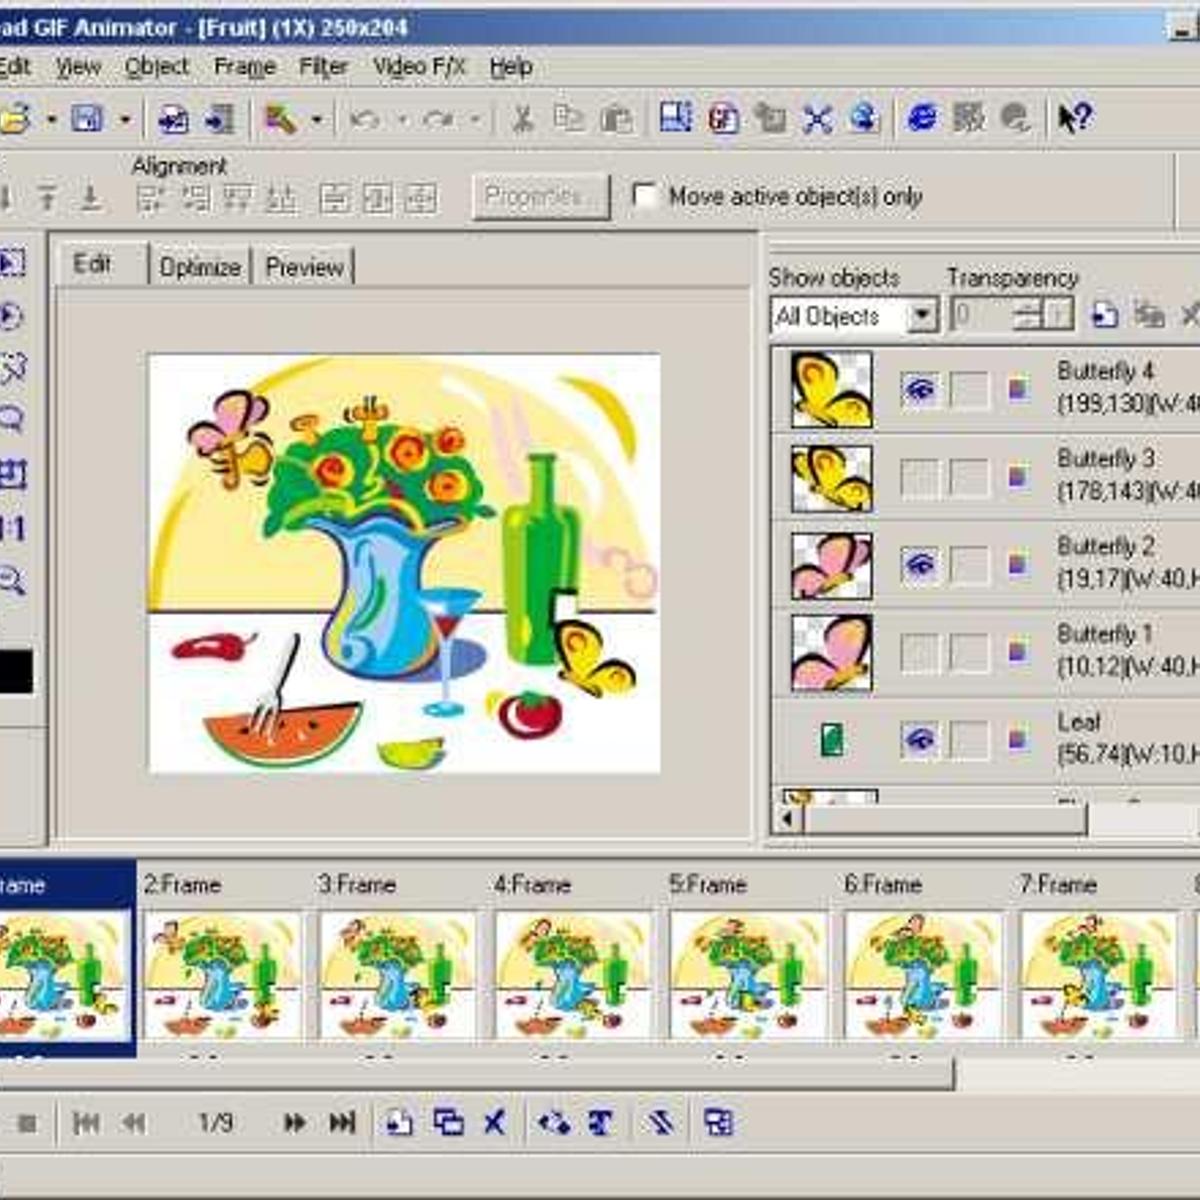 Шутка, программа для анимации картинок на телефоне